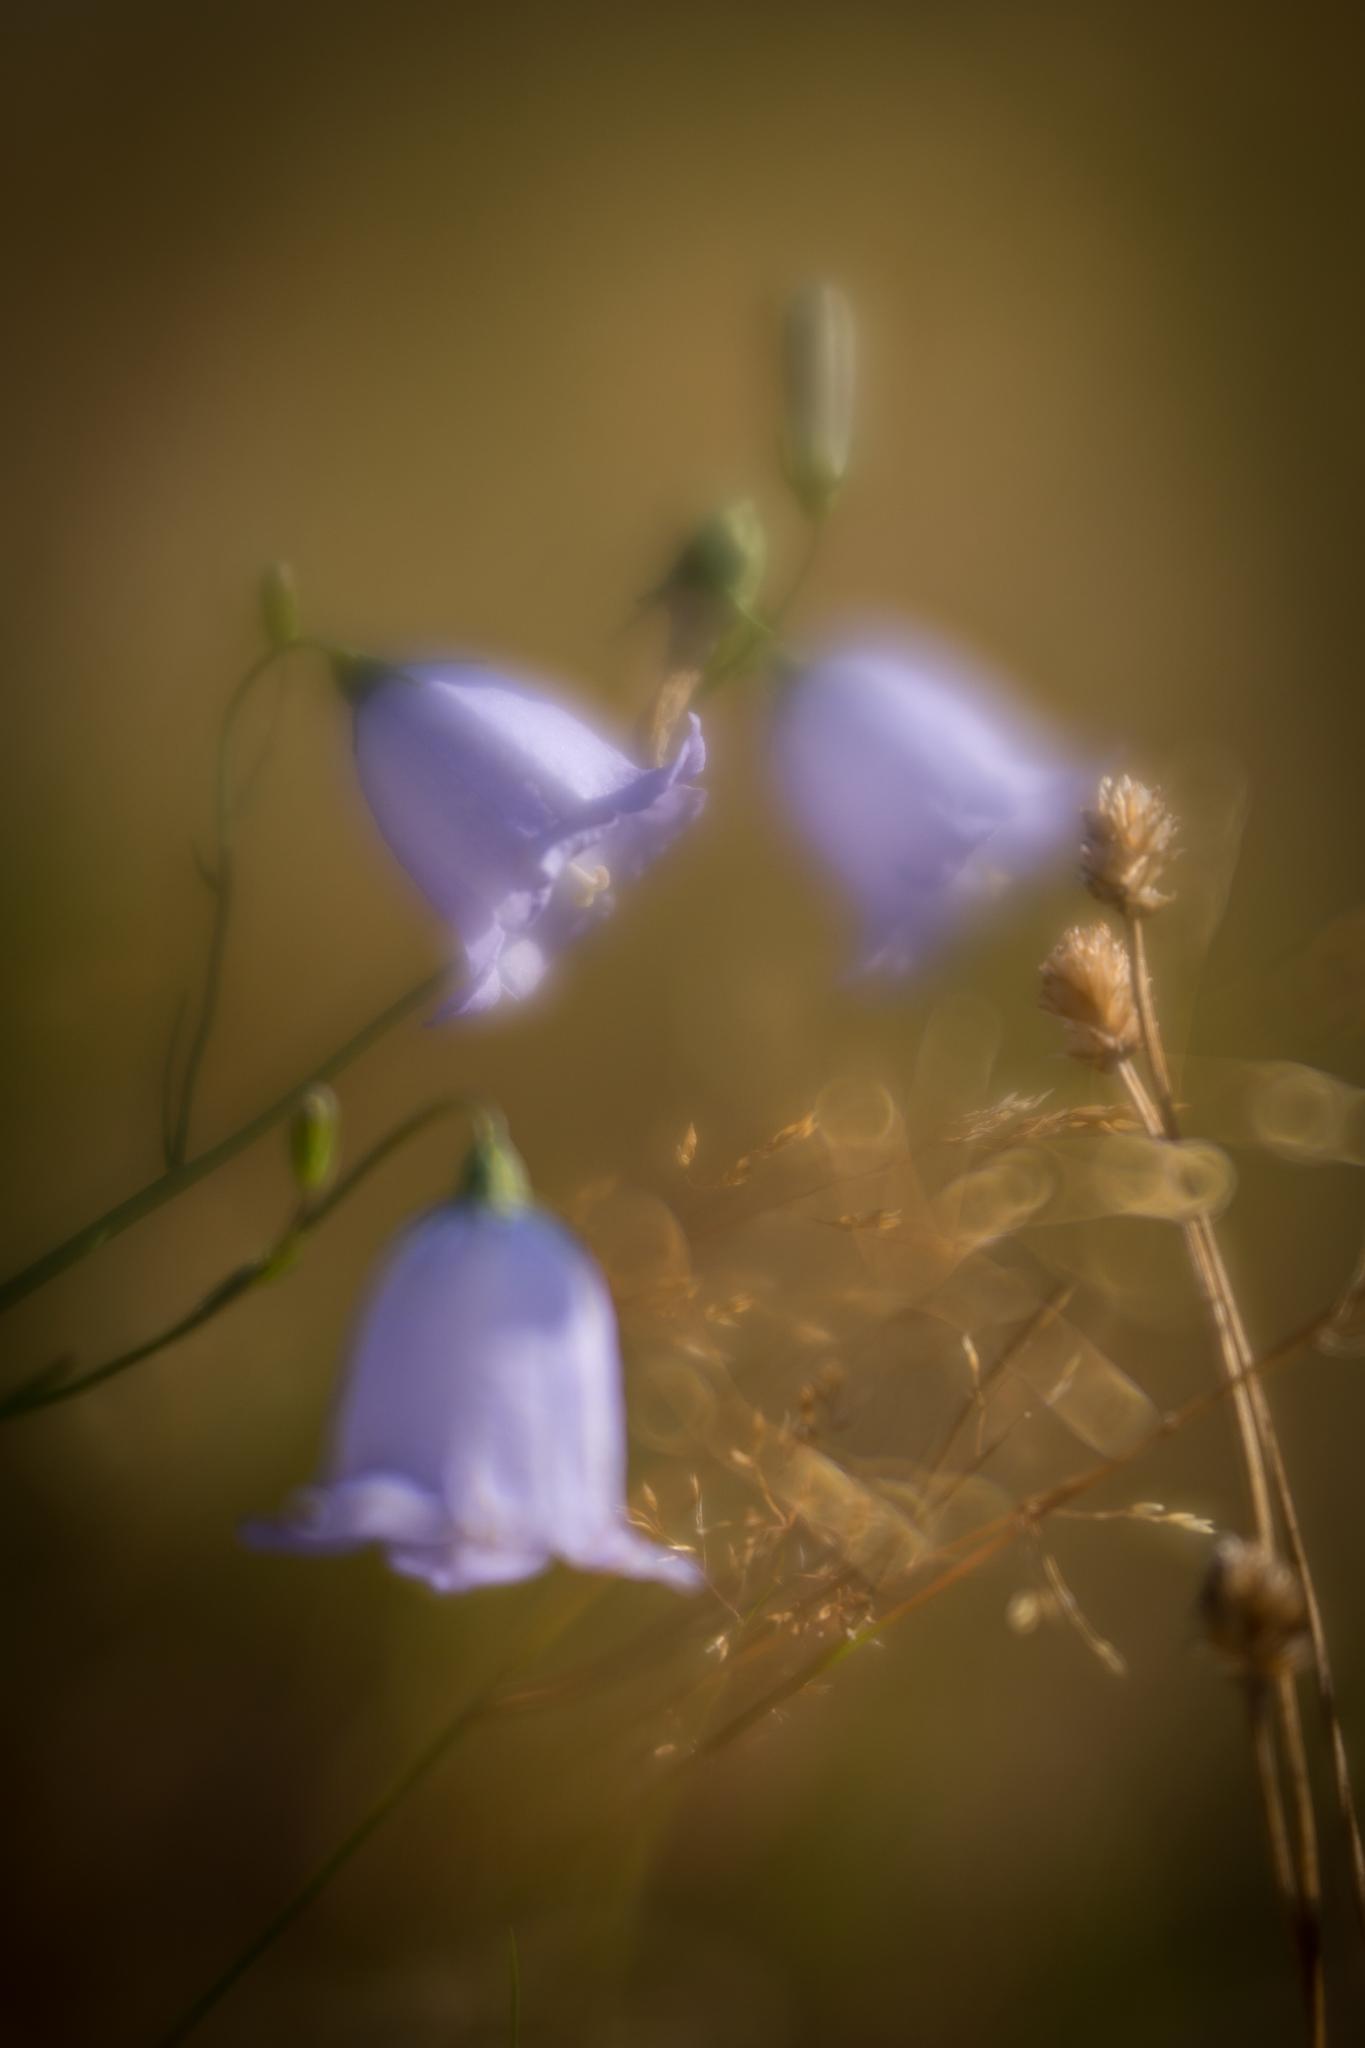 Harebells on Malvern common by Seonaid Teal Photography